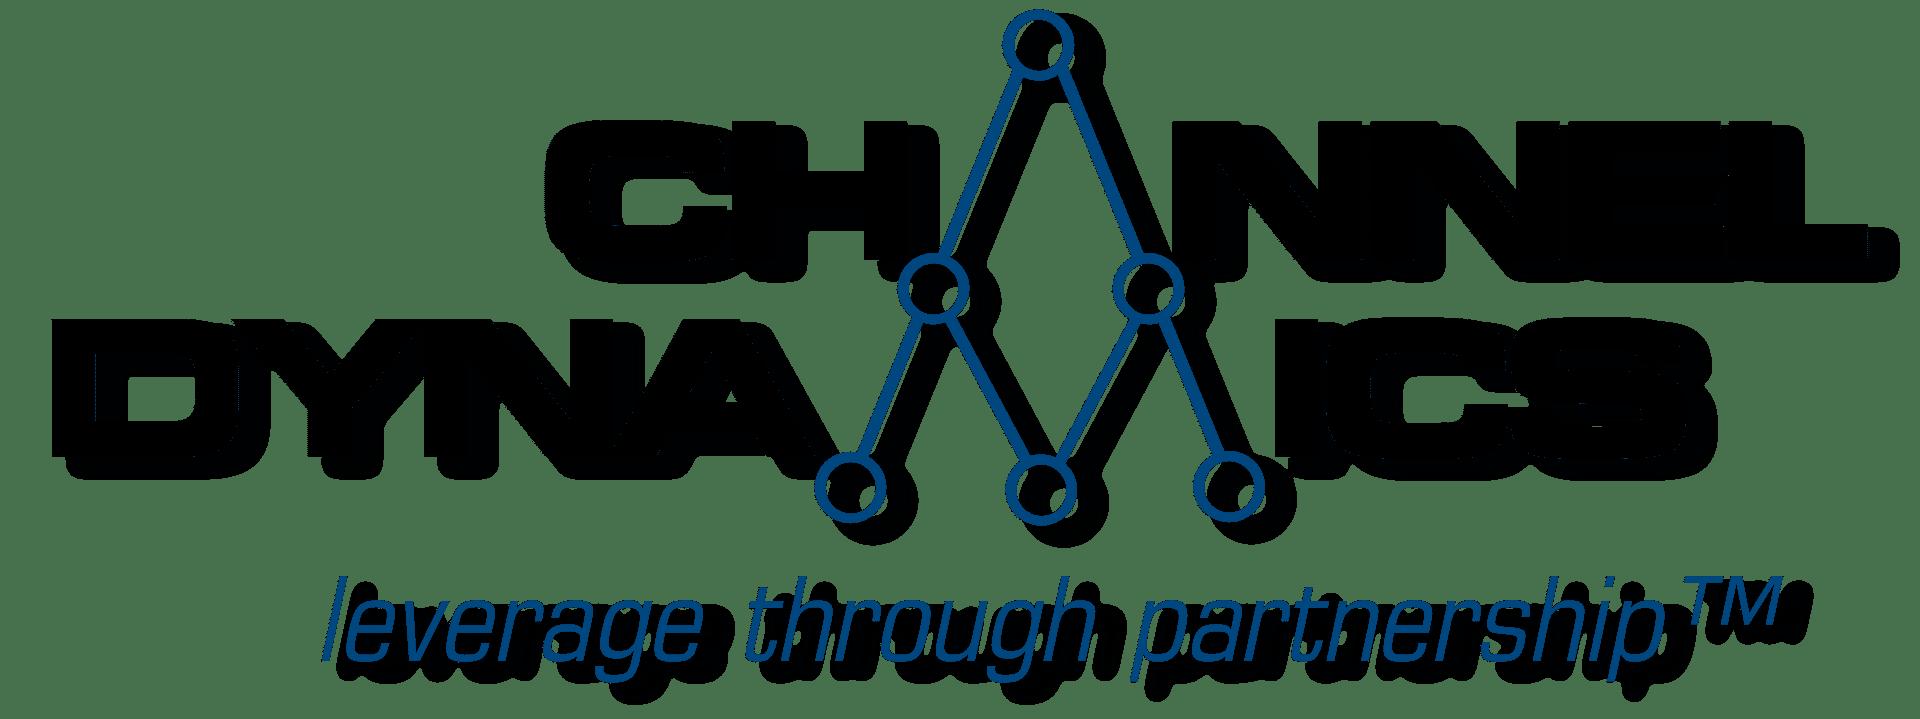 Channel Dynamics - Leverage Through Partnership